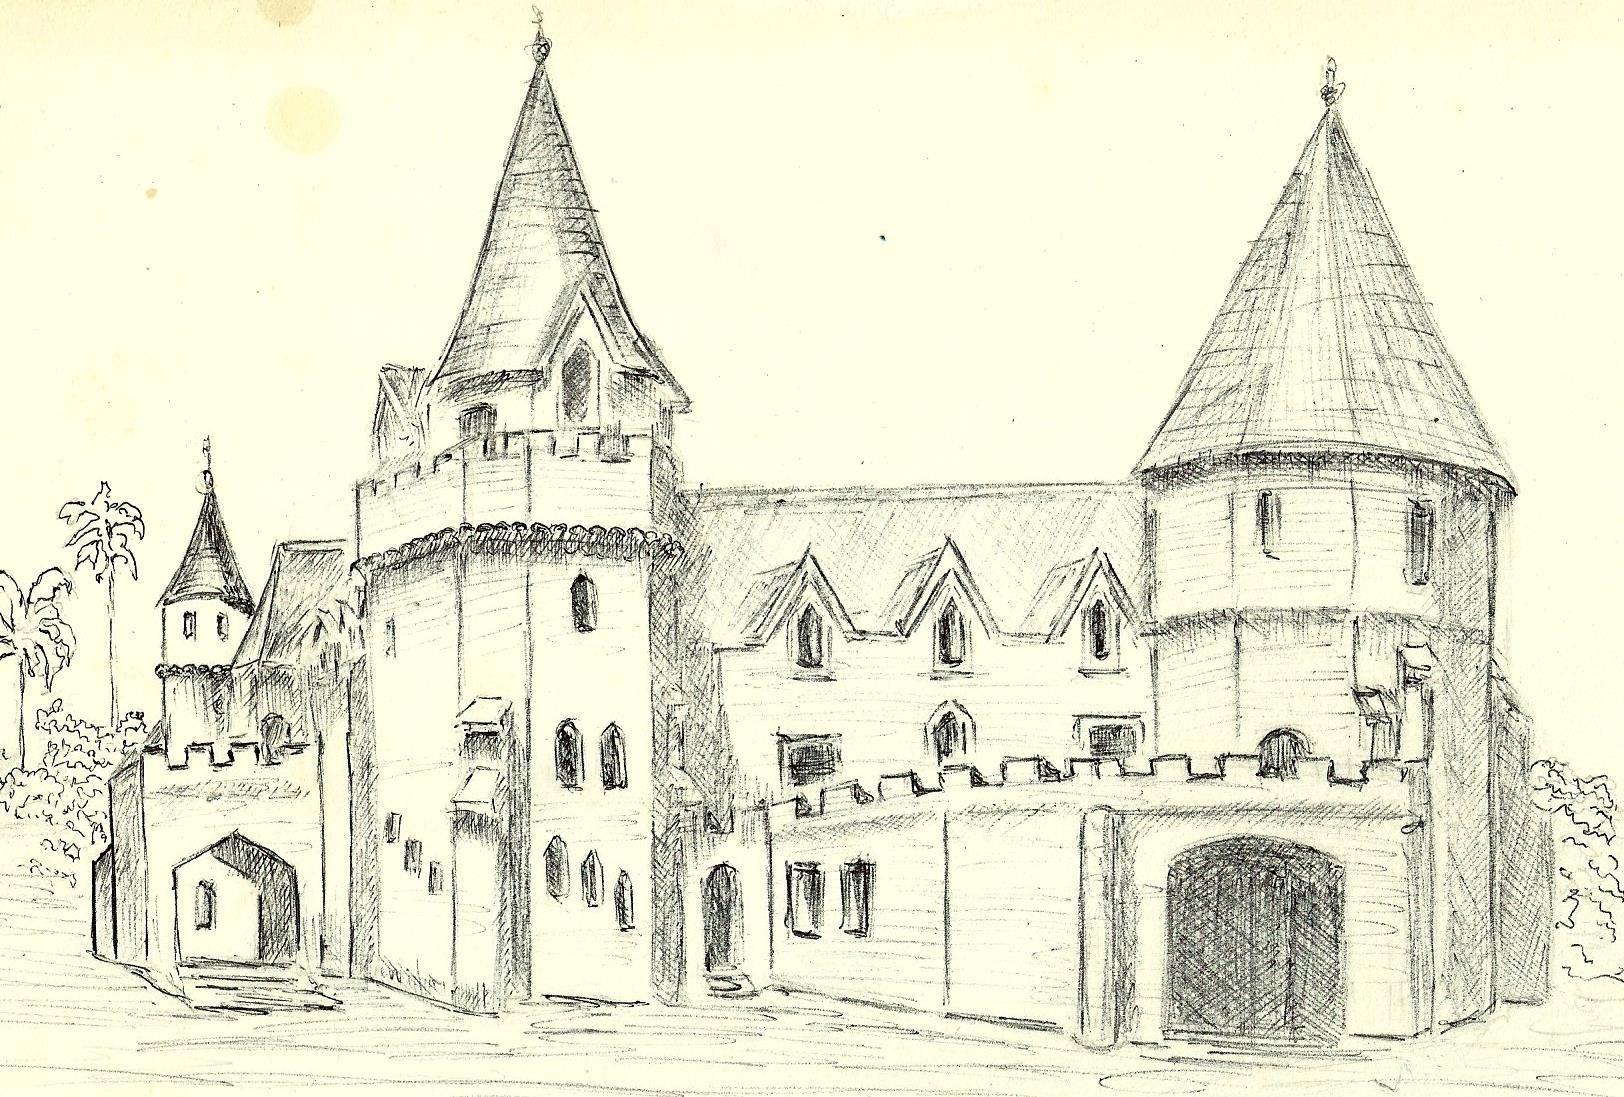 Castelo De Itaipava Petropolis Rj Itaipava Petropolis Rj E